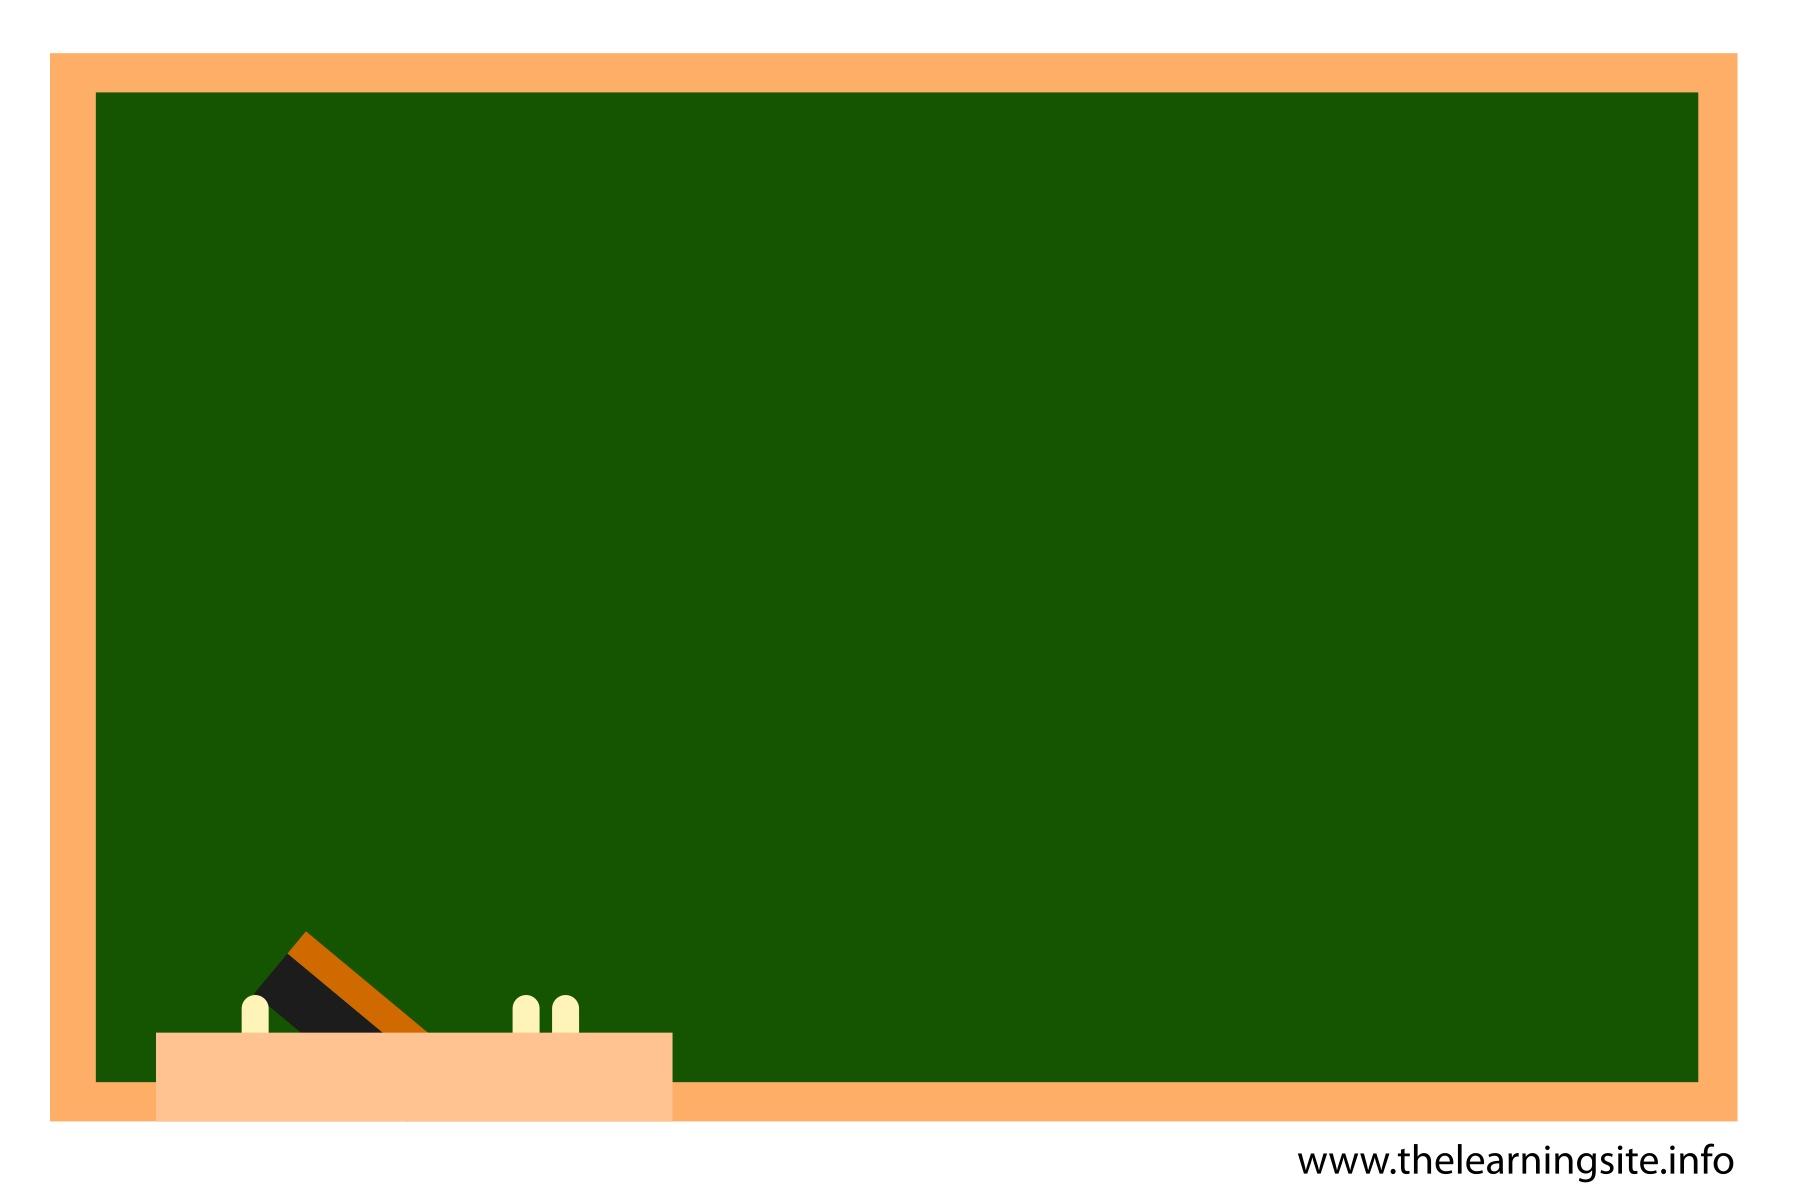 Clean blackboard clipart 5 » Clipart Station.